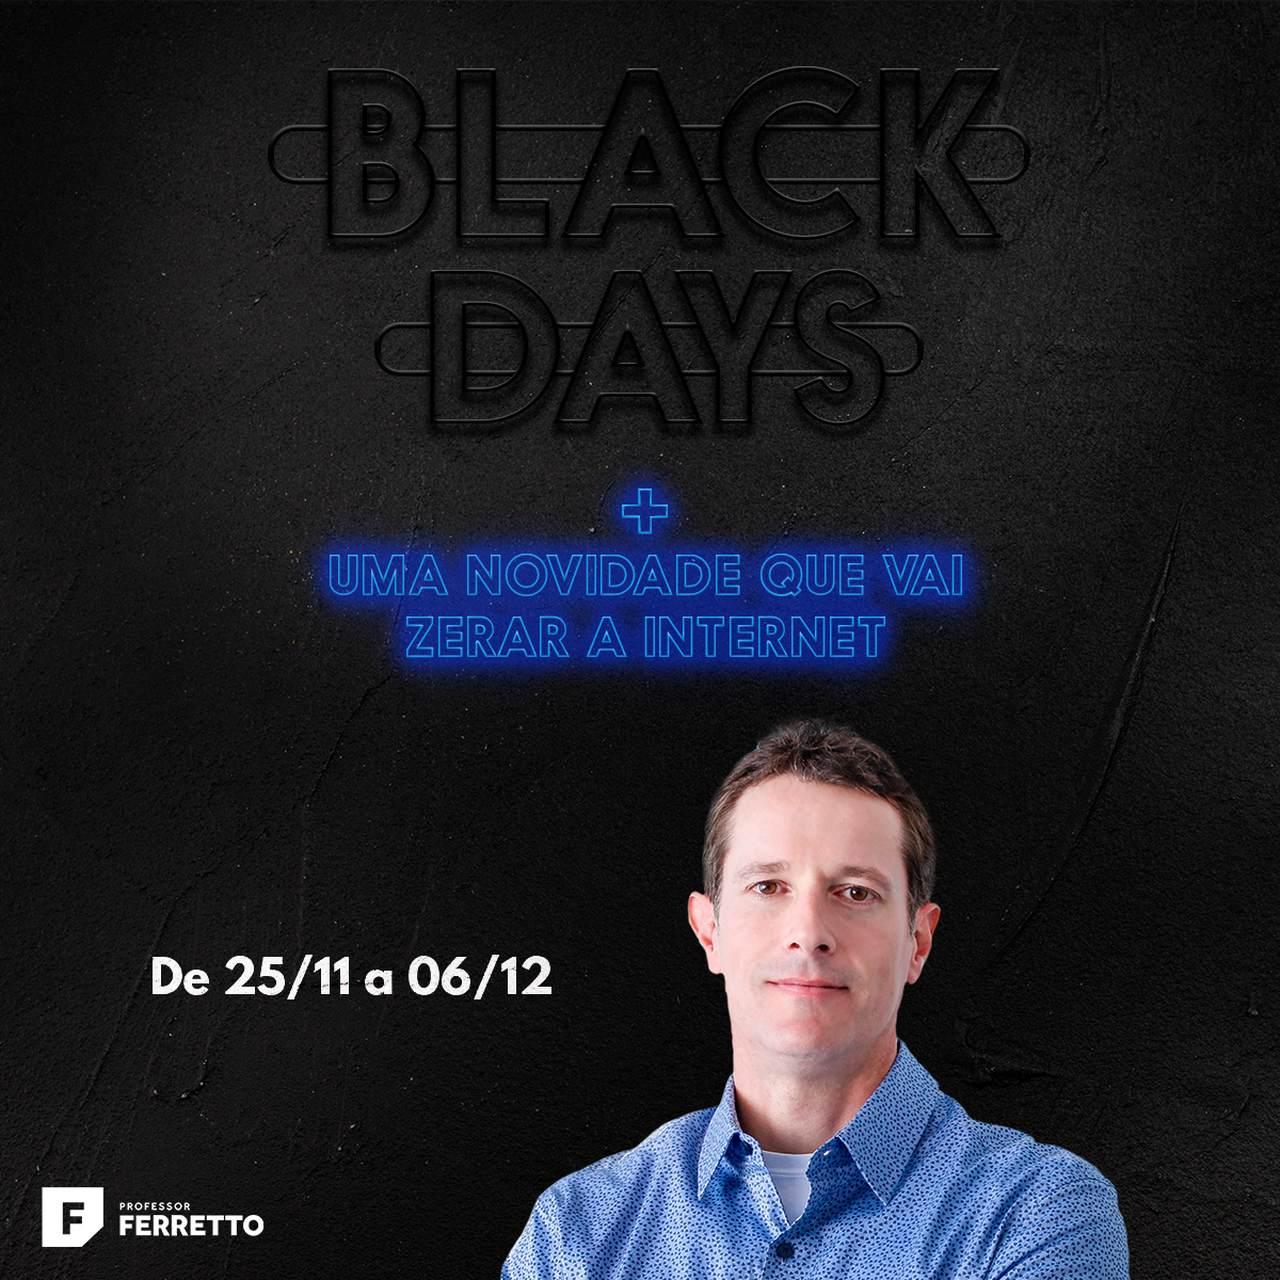 Cursos para aproveitar na Black Friday